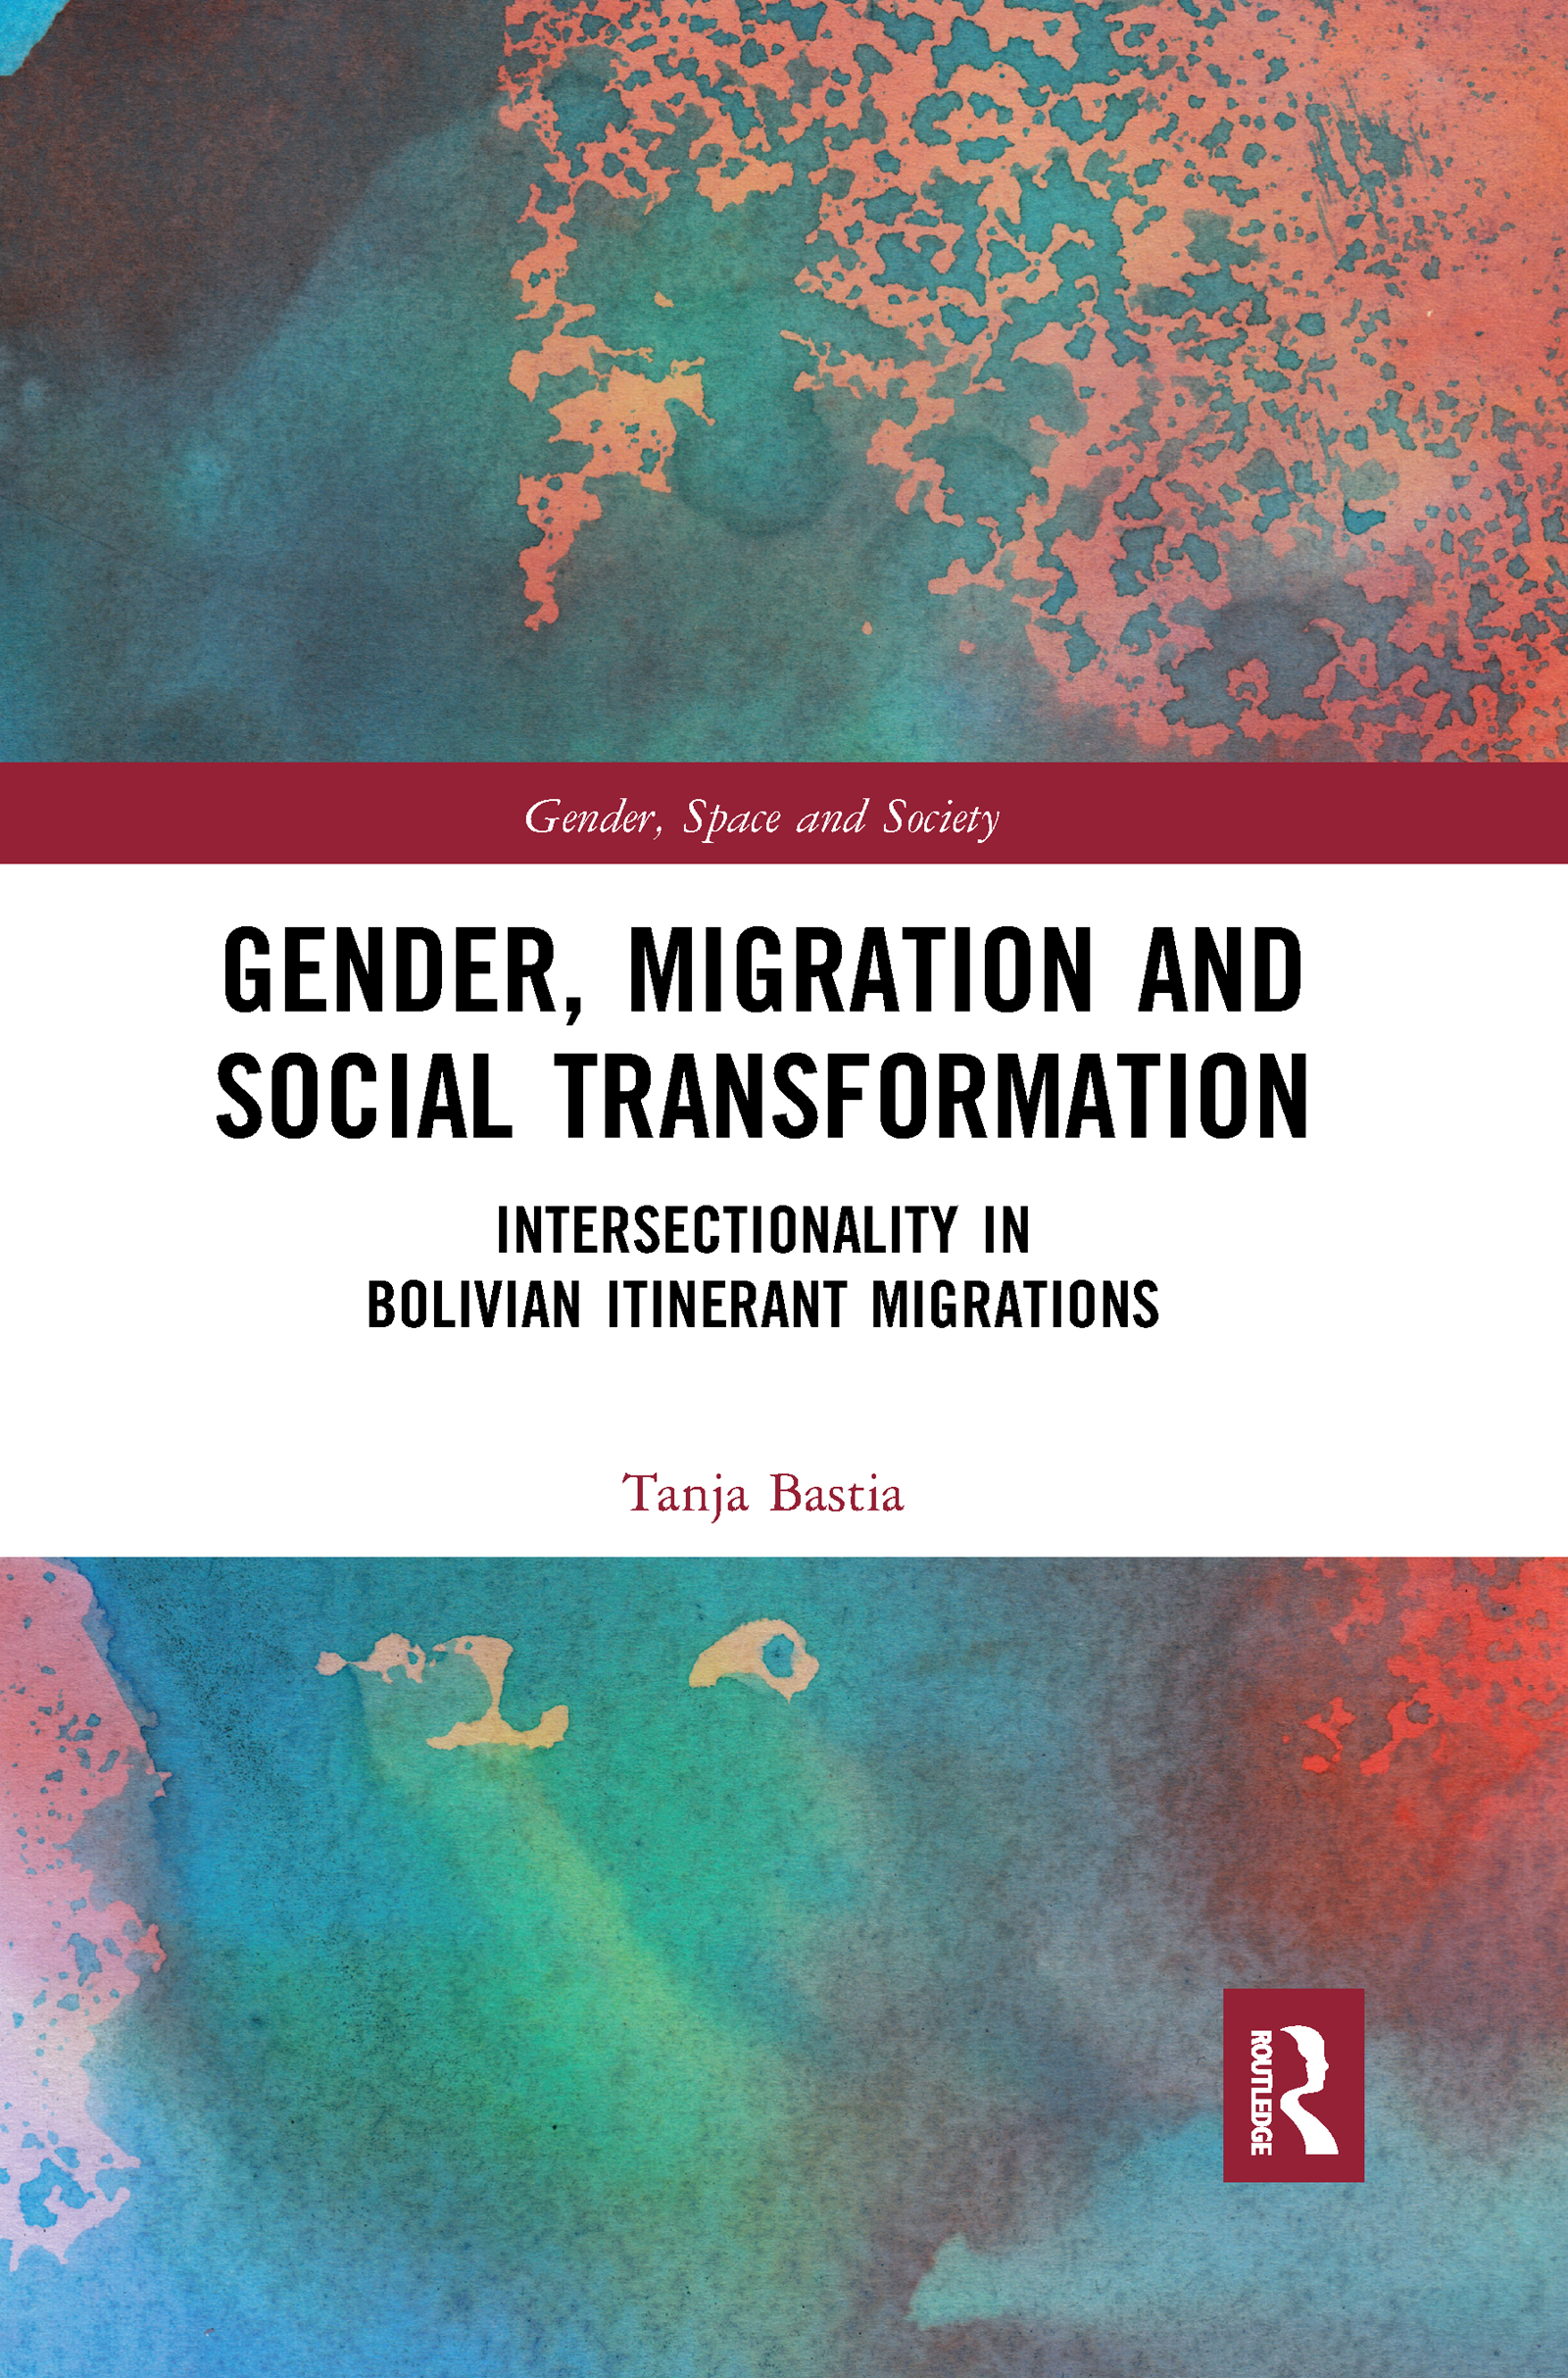 Gender, Migration and Social Transformation